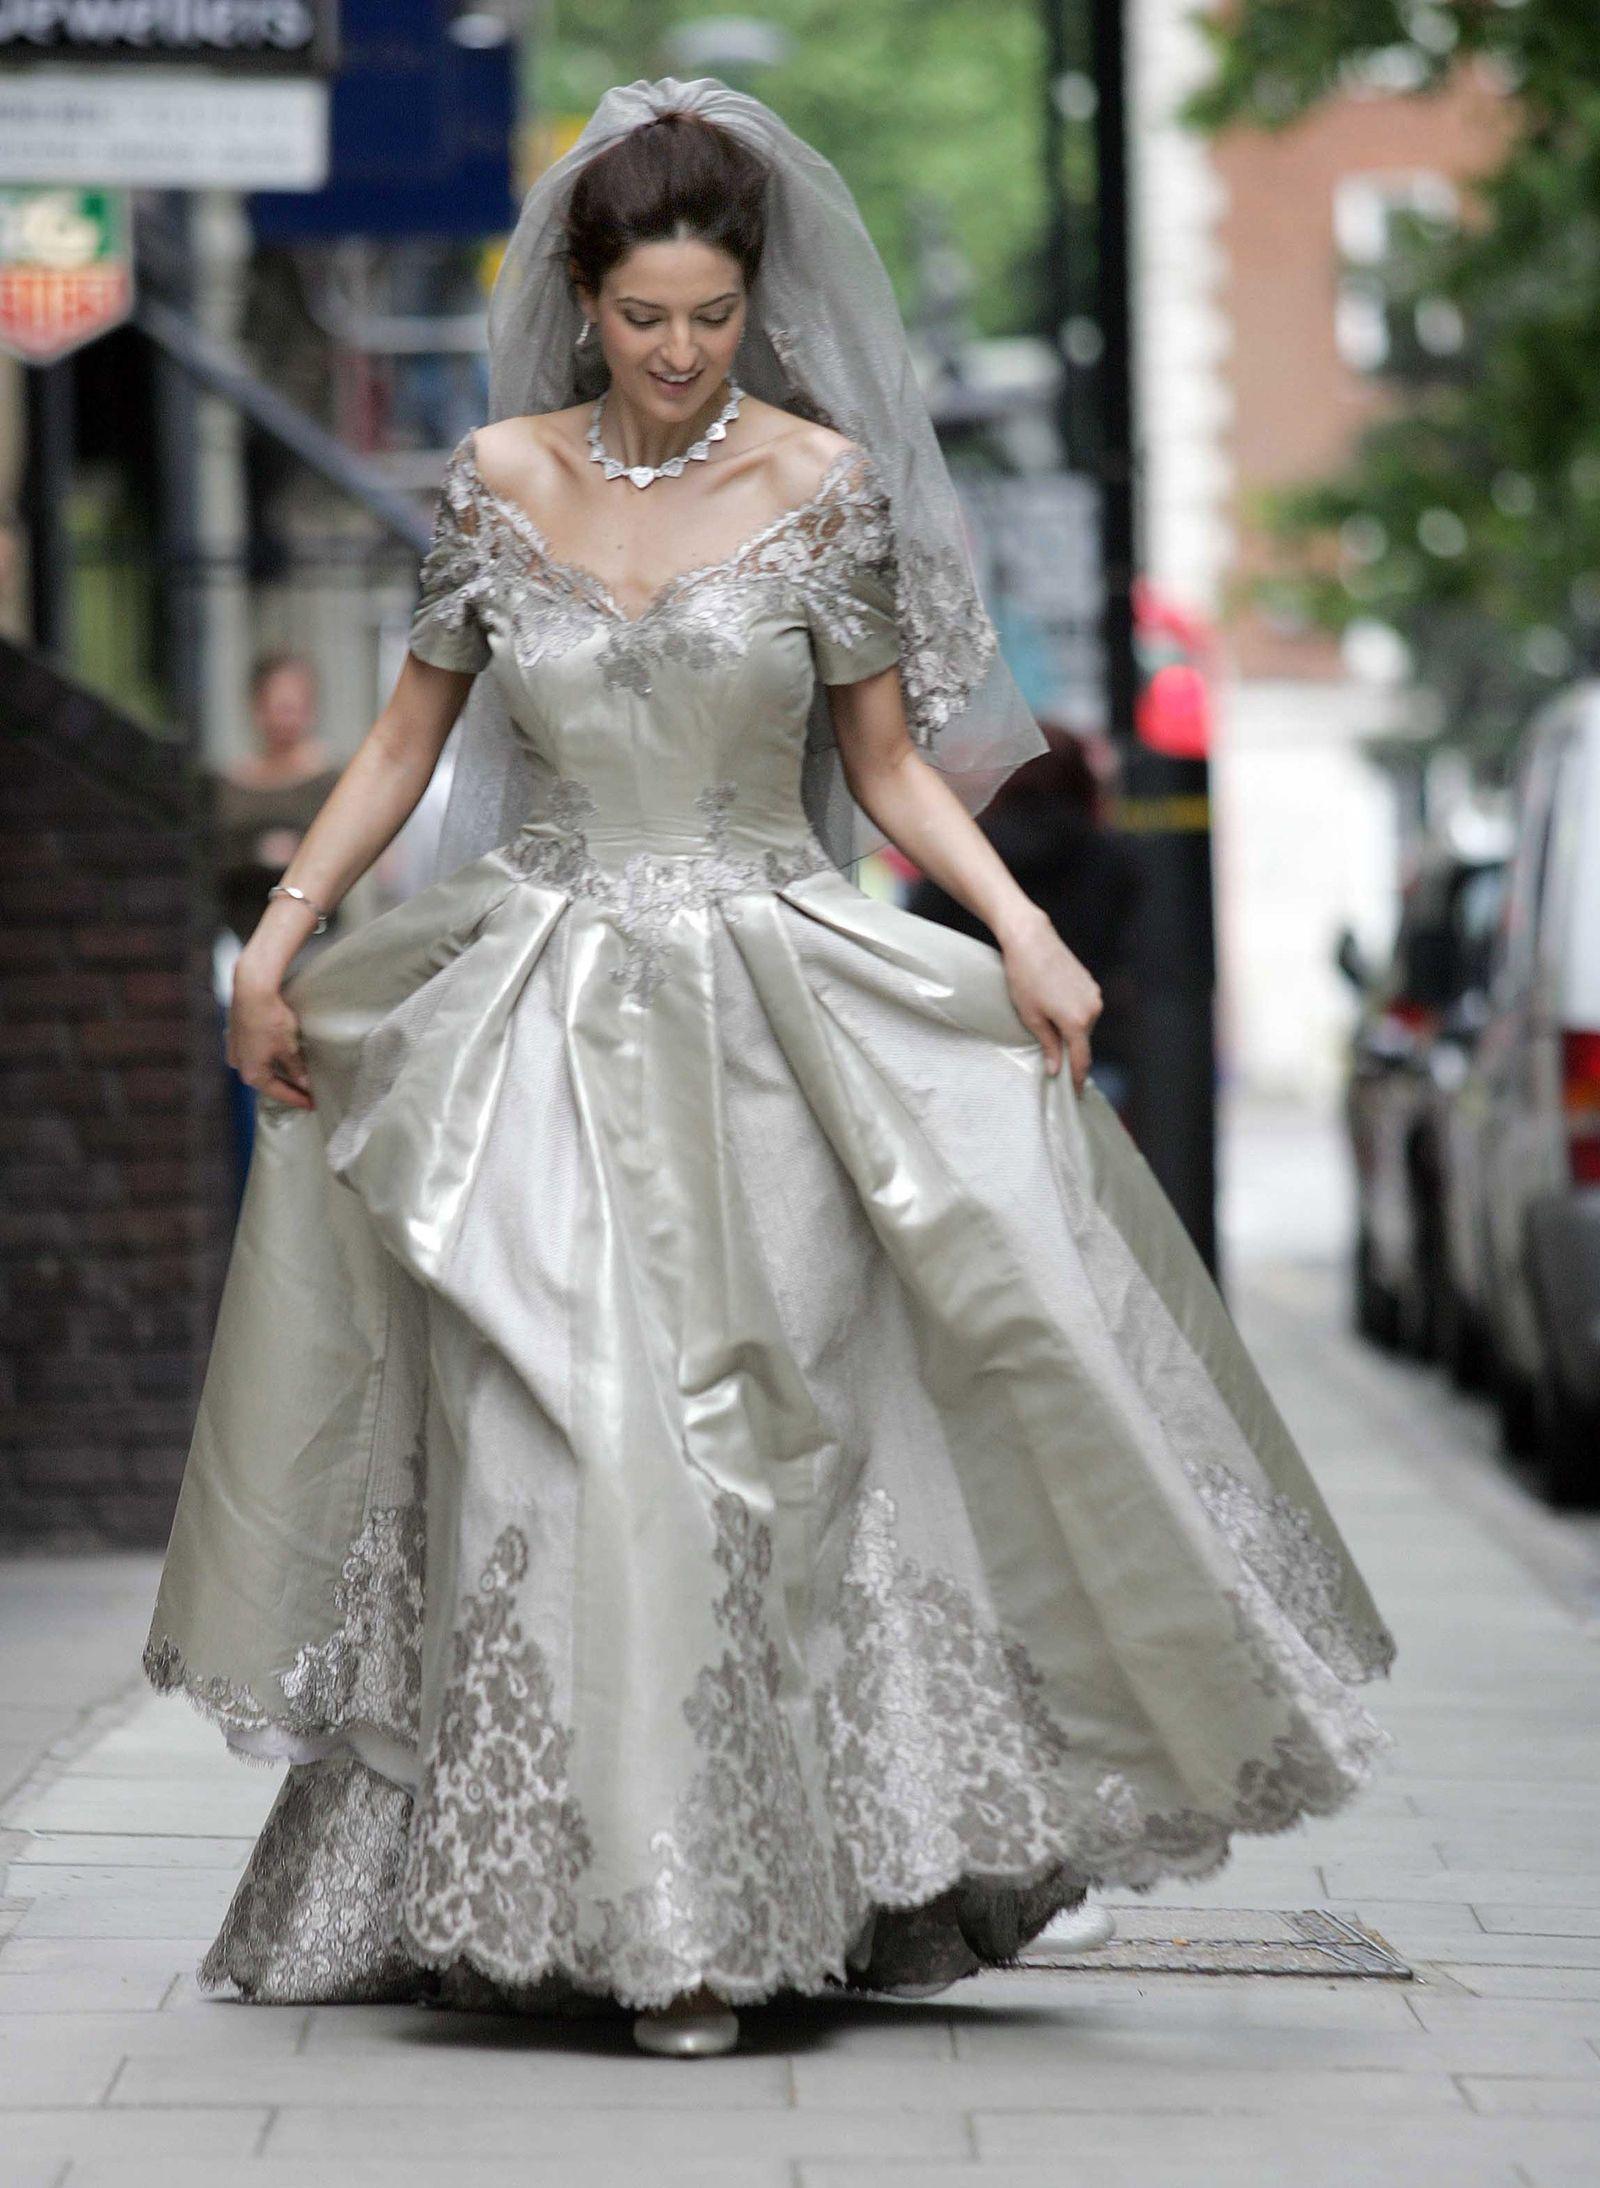 Sarah burton wedding dress  These are the most expensive wedding dresses of all time  Expensive